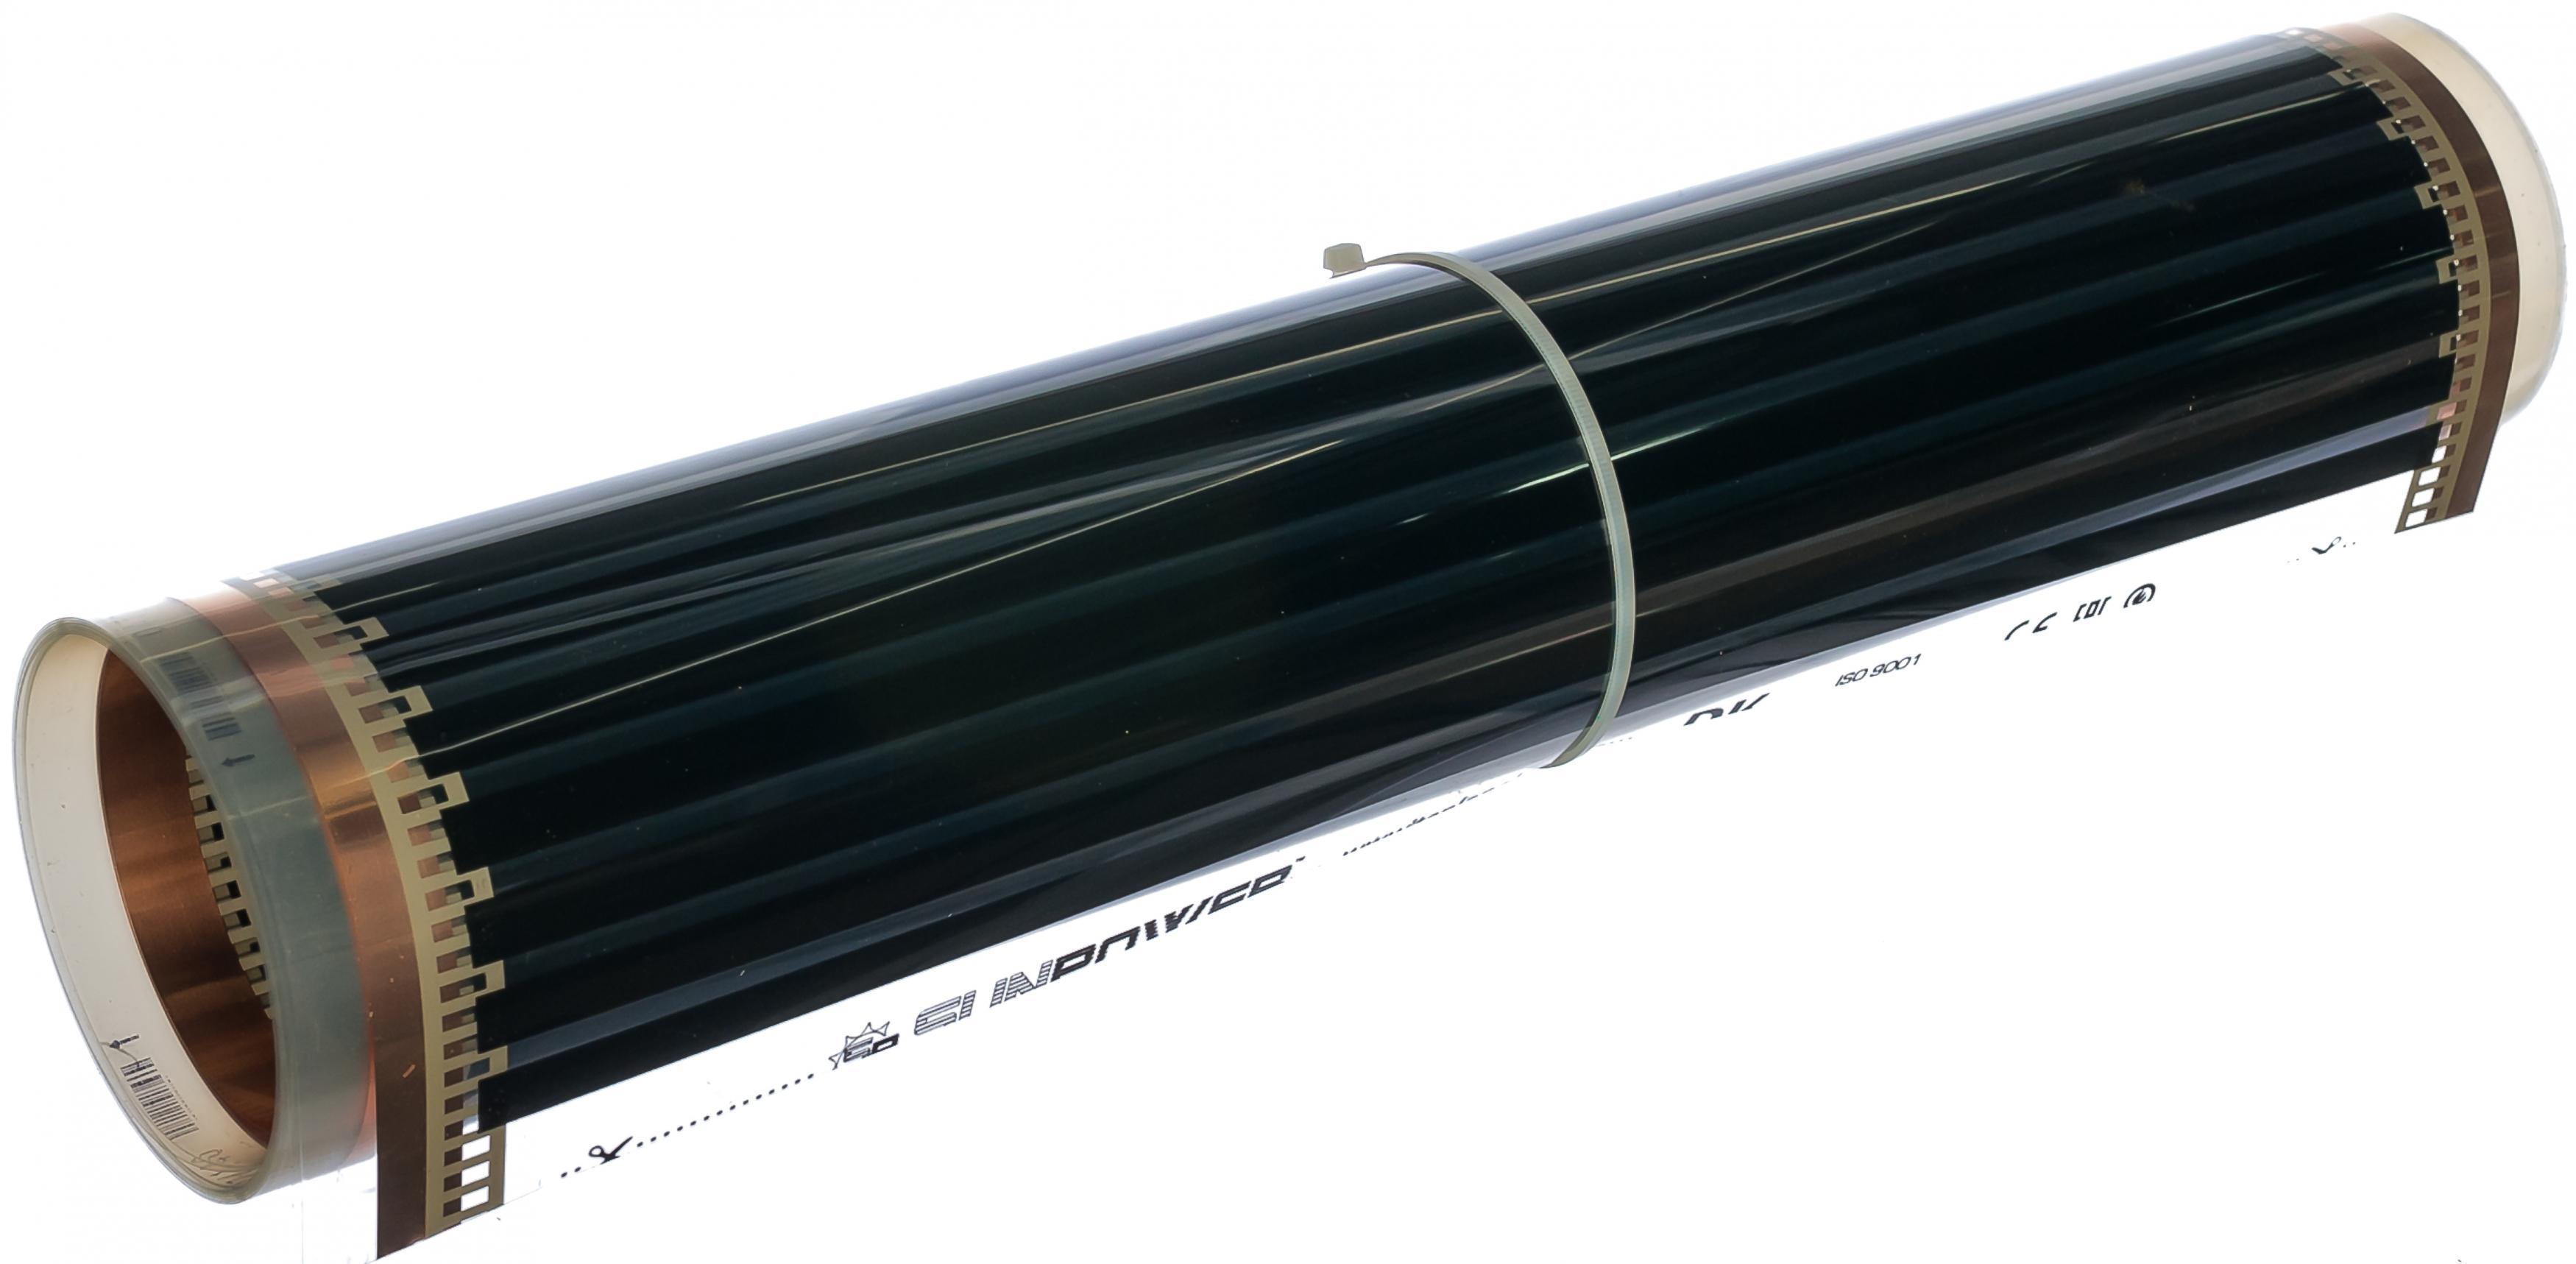 лучшая цена Теплый пол Sun power Spf 50-180-2